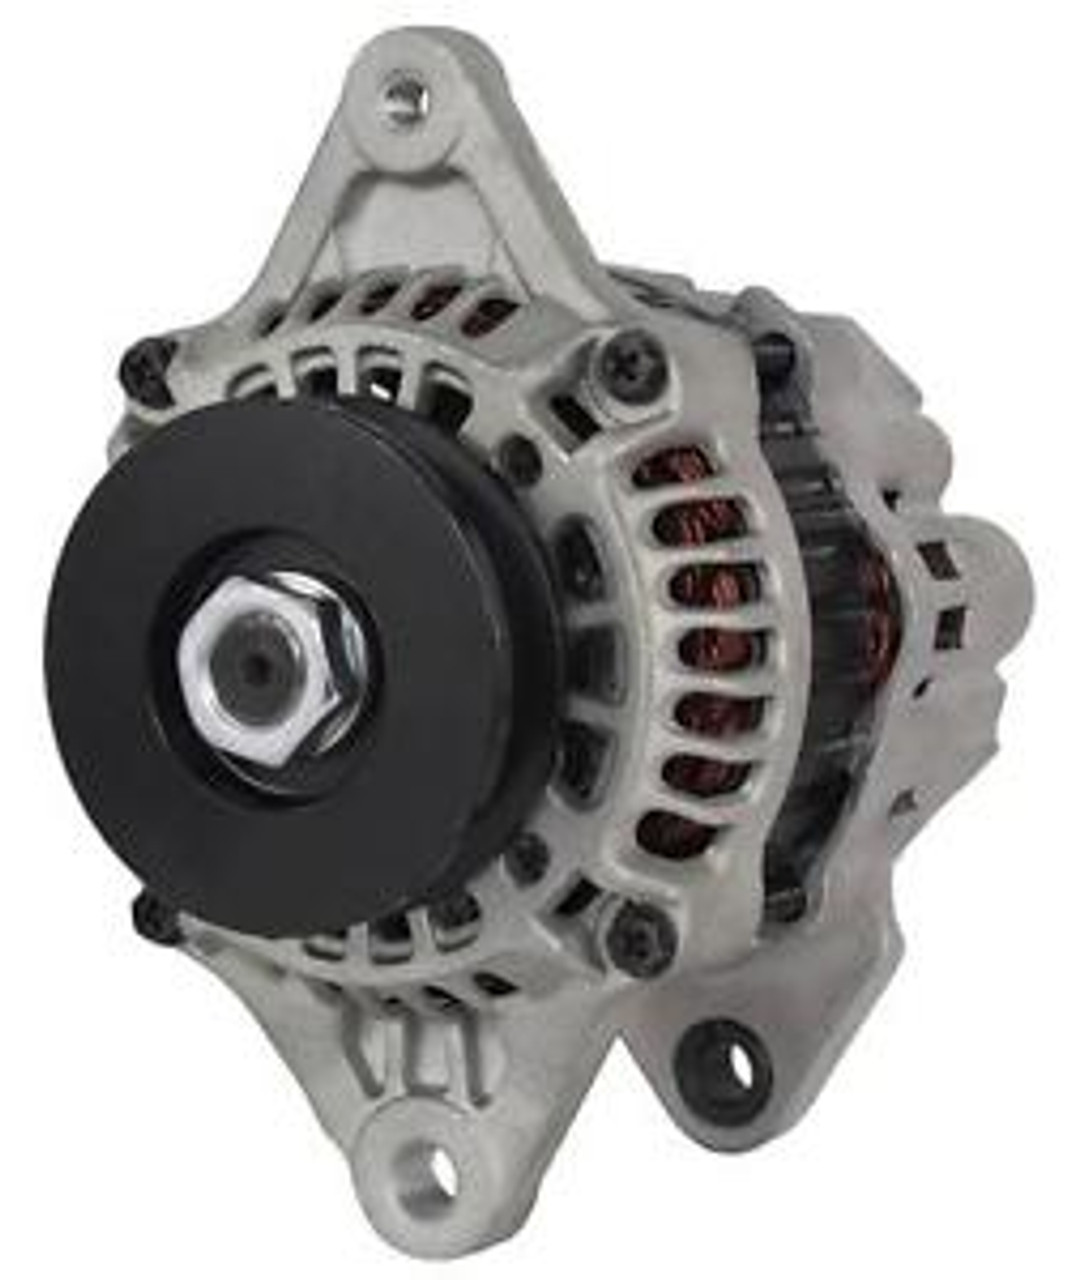 Perkins Perama M30 Alternator 3-point mounting - parts4engines.com